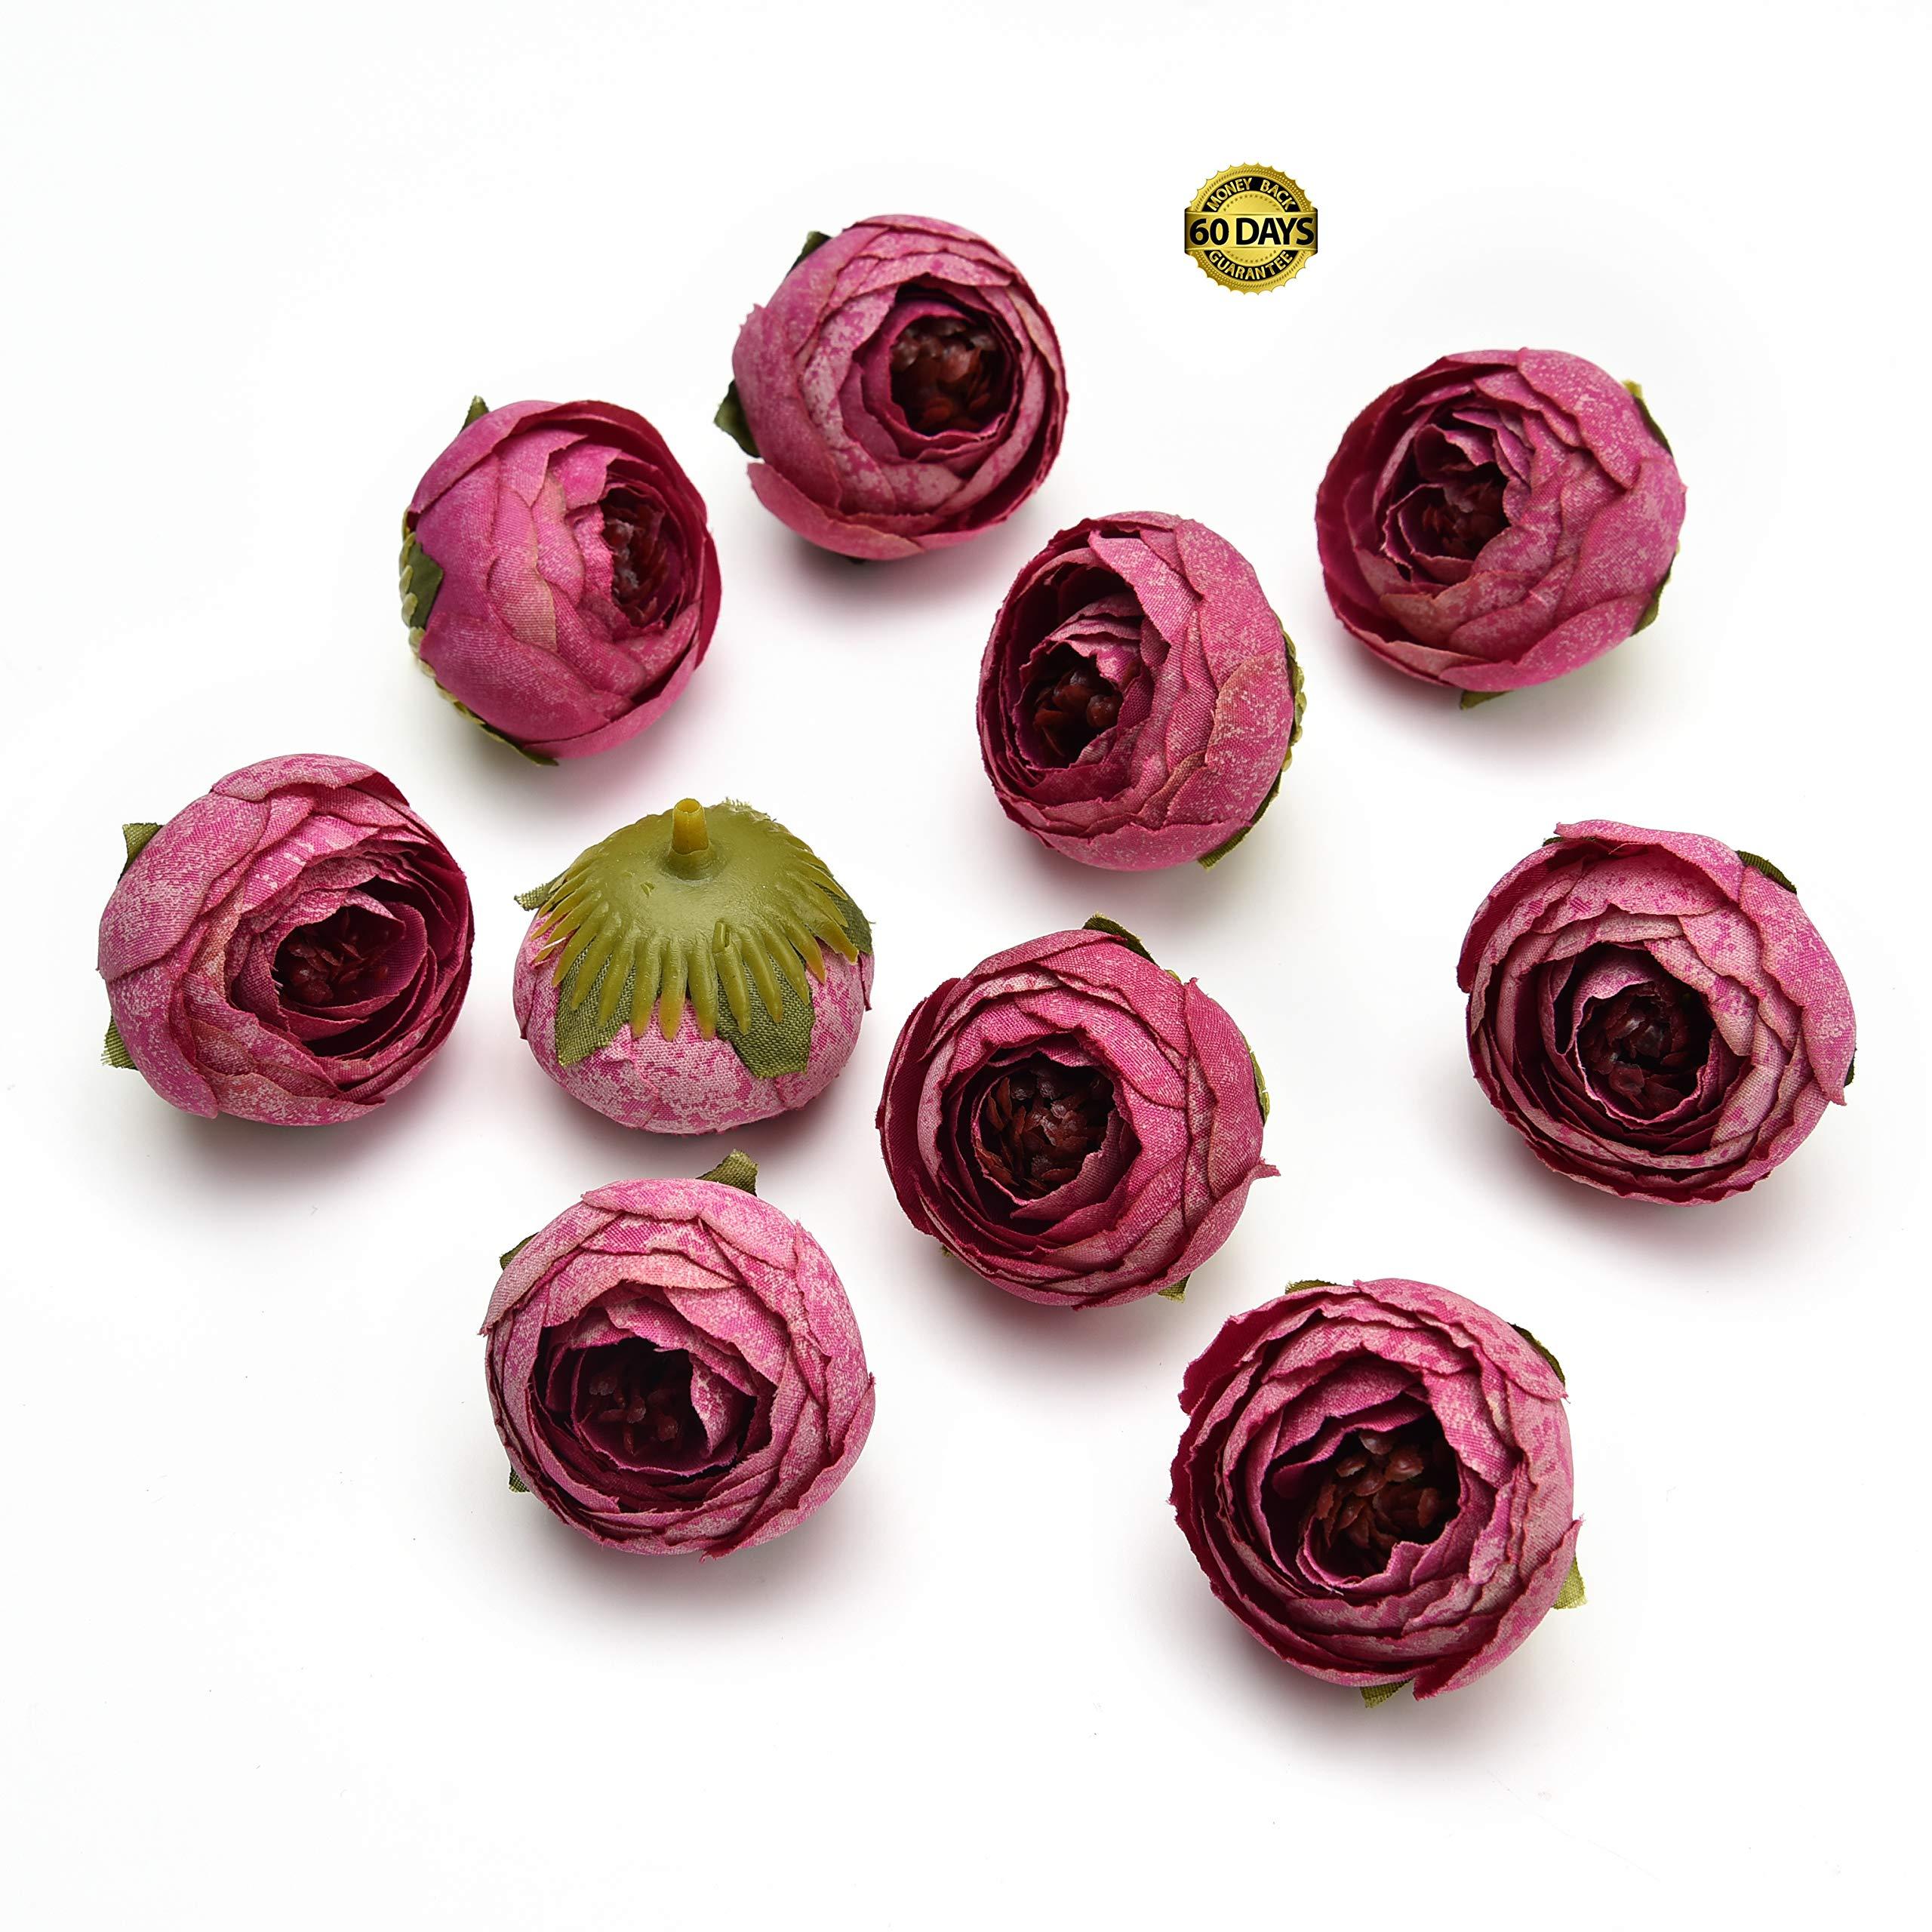 Artificial Fake Flower Silk Rose Little Peony Heads Bulk Wedding Party Home Deco